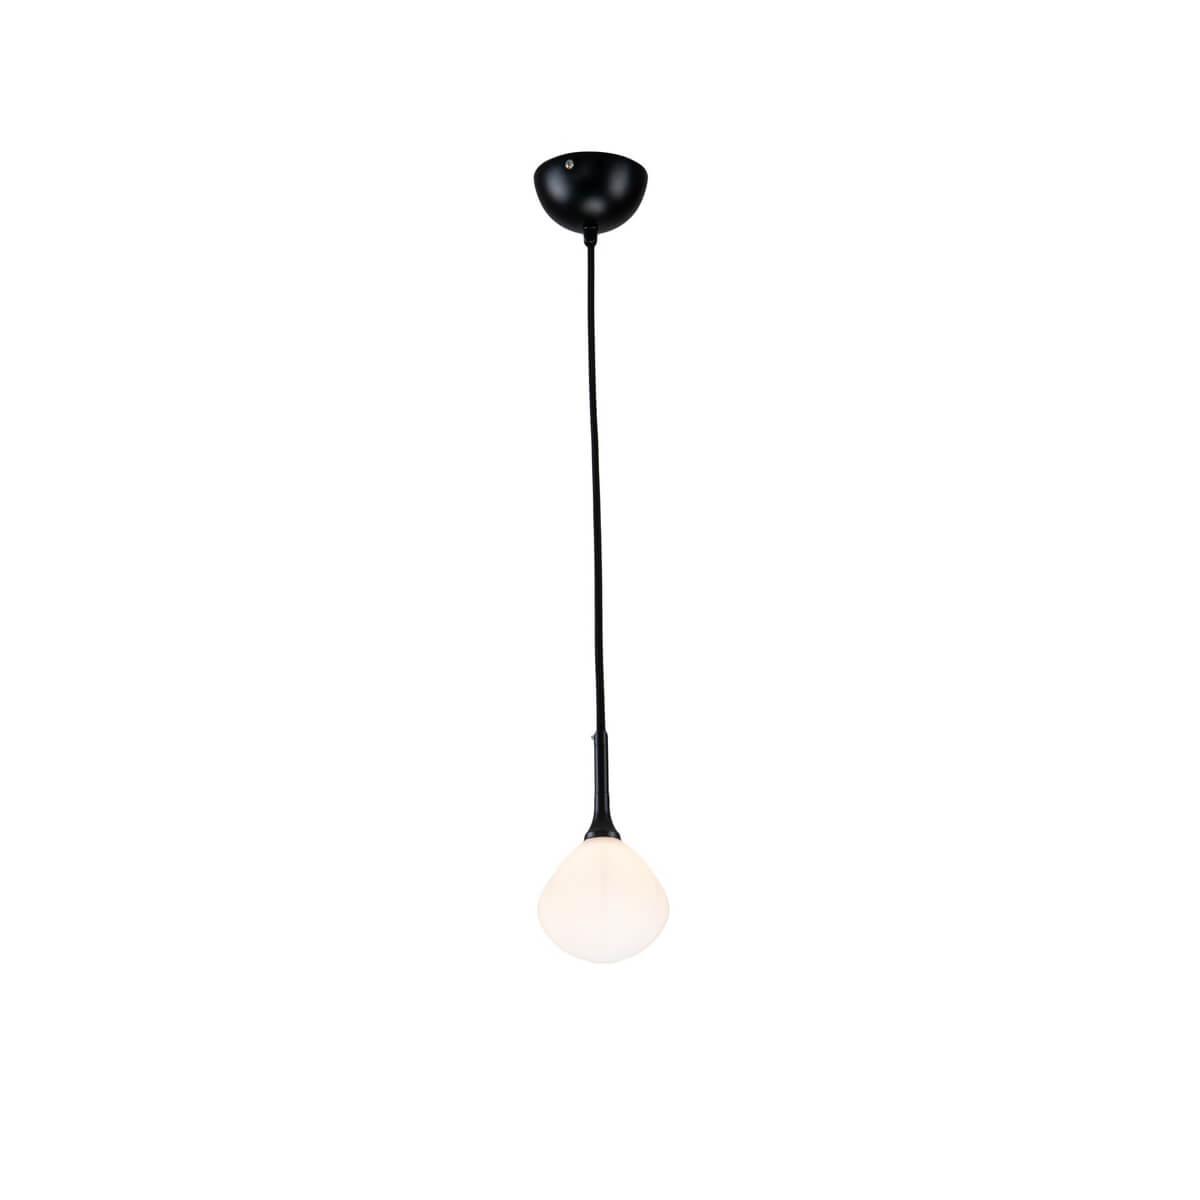 Светильник Favourite 2688-1P Suri недорого